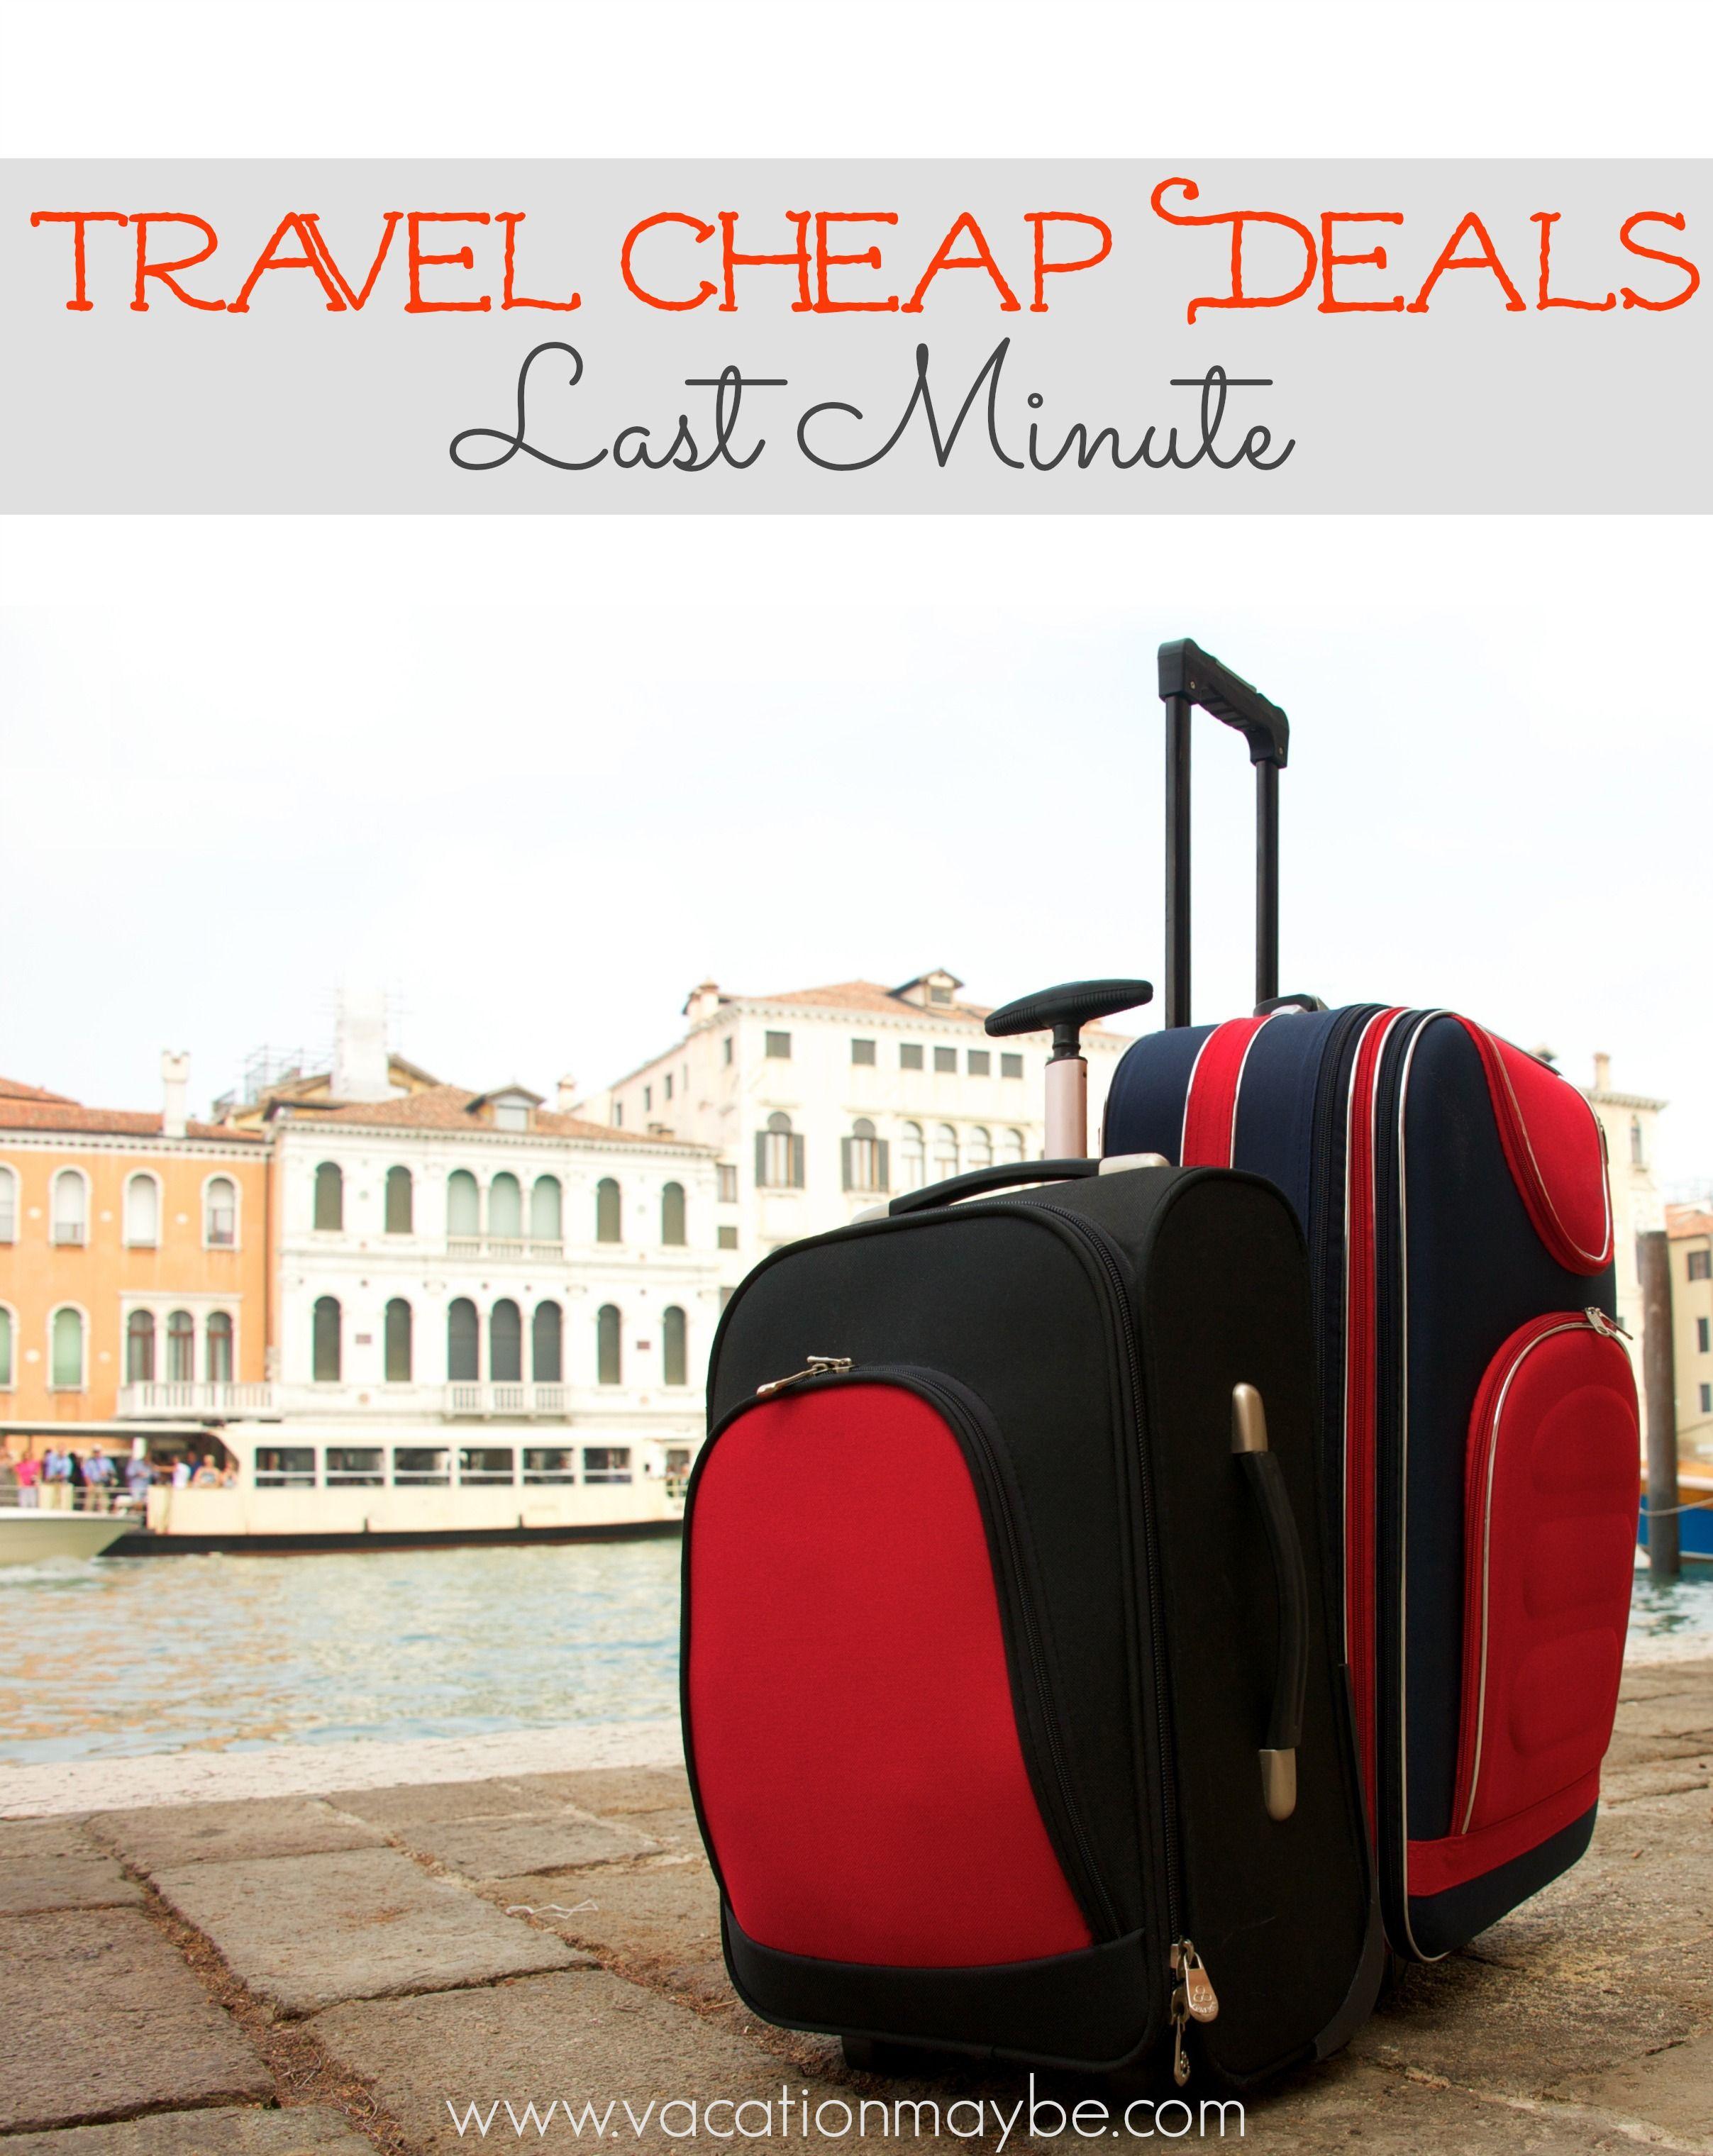 Travel Cheap Deals Last Minute  Cheap travel Last minute